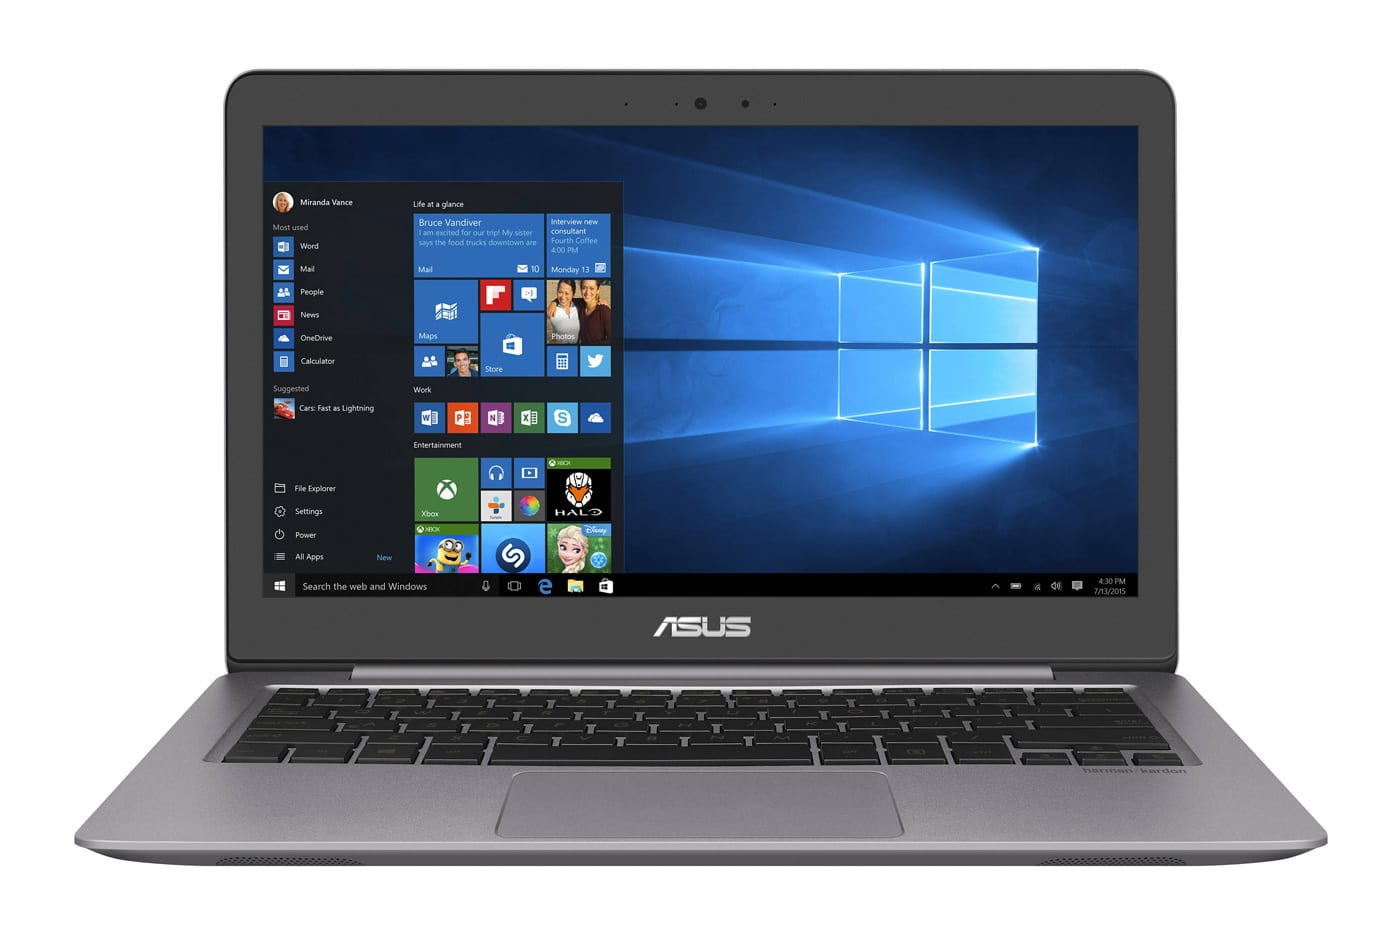 Asus ZenBook UX310UA-GL436T à 699€, Ultrabook 13 pouces Full HD Kaby Lake i5